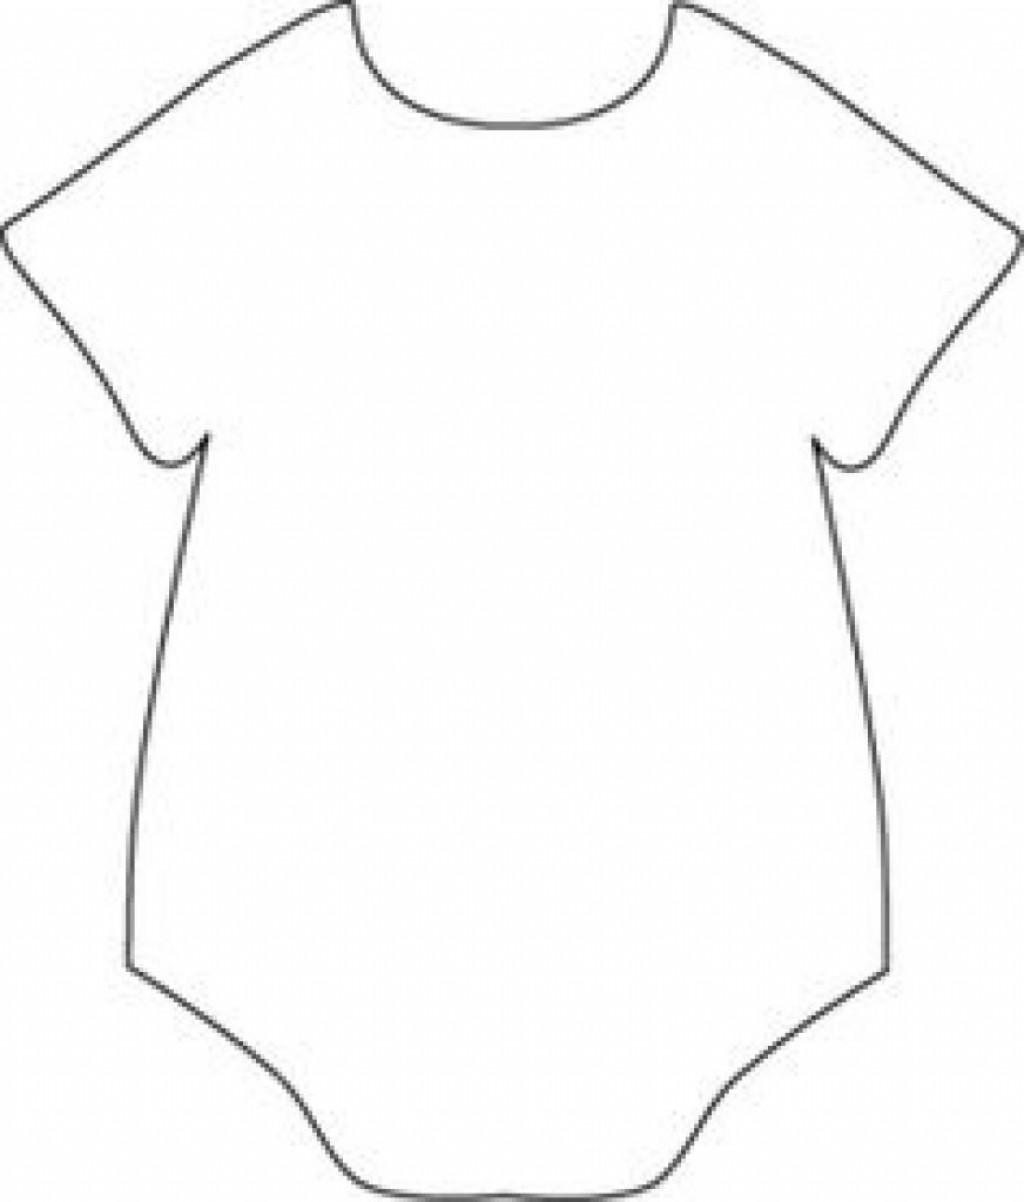 002 Fantastic Onesie Baby Shower Invitation Template High Resolution  FreeLarge